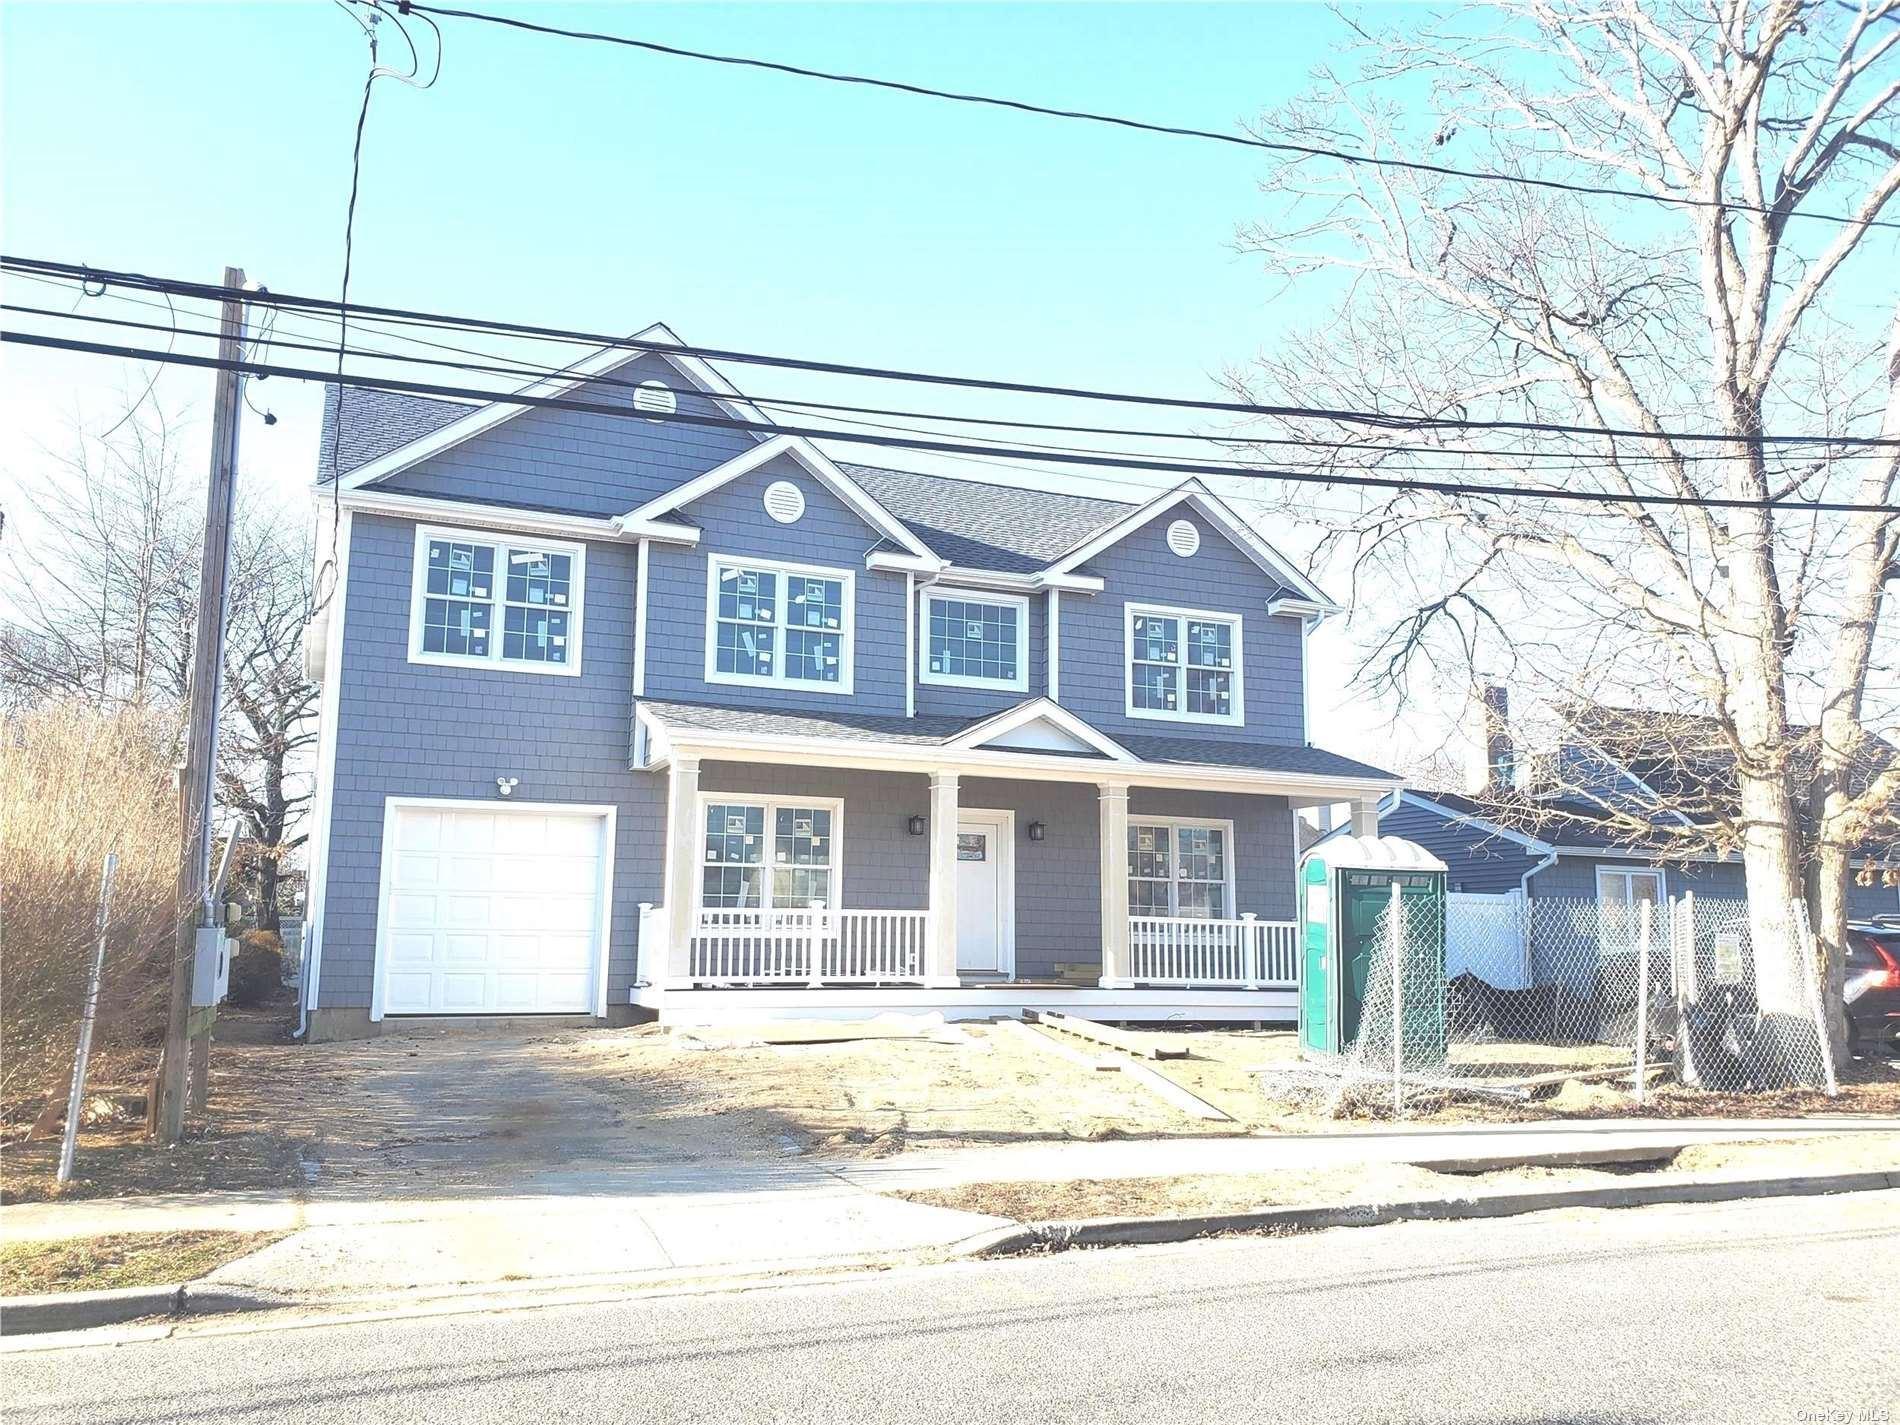 154 Maple Street, Massapequa Park, NY 11762 - MLS#: 3229250